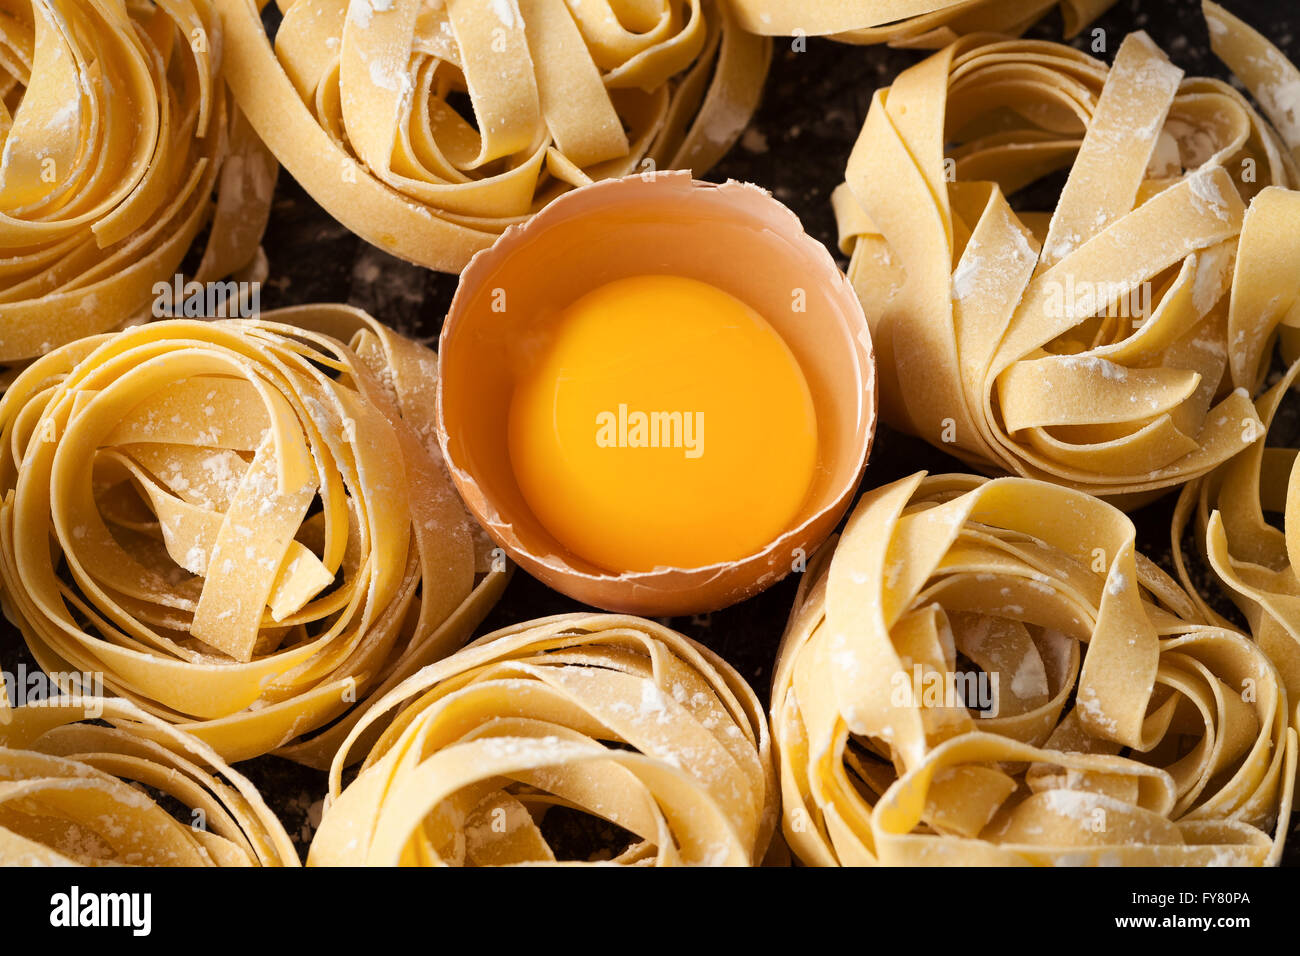 Cuisine italienne pâtes fettuccine vie télévision rustique encore jeter fond noir tagliatelle alfredo Photo Stock